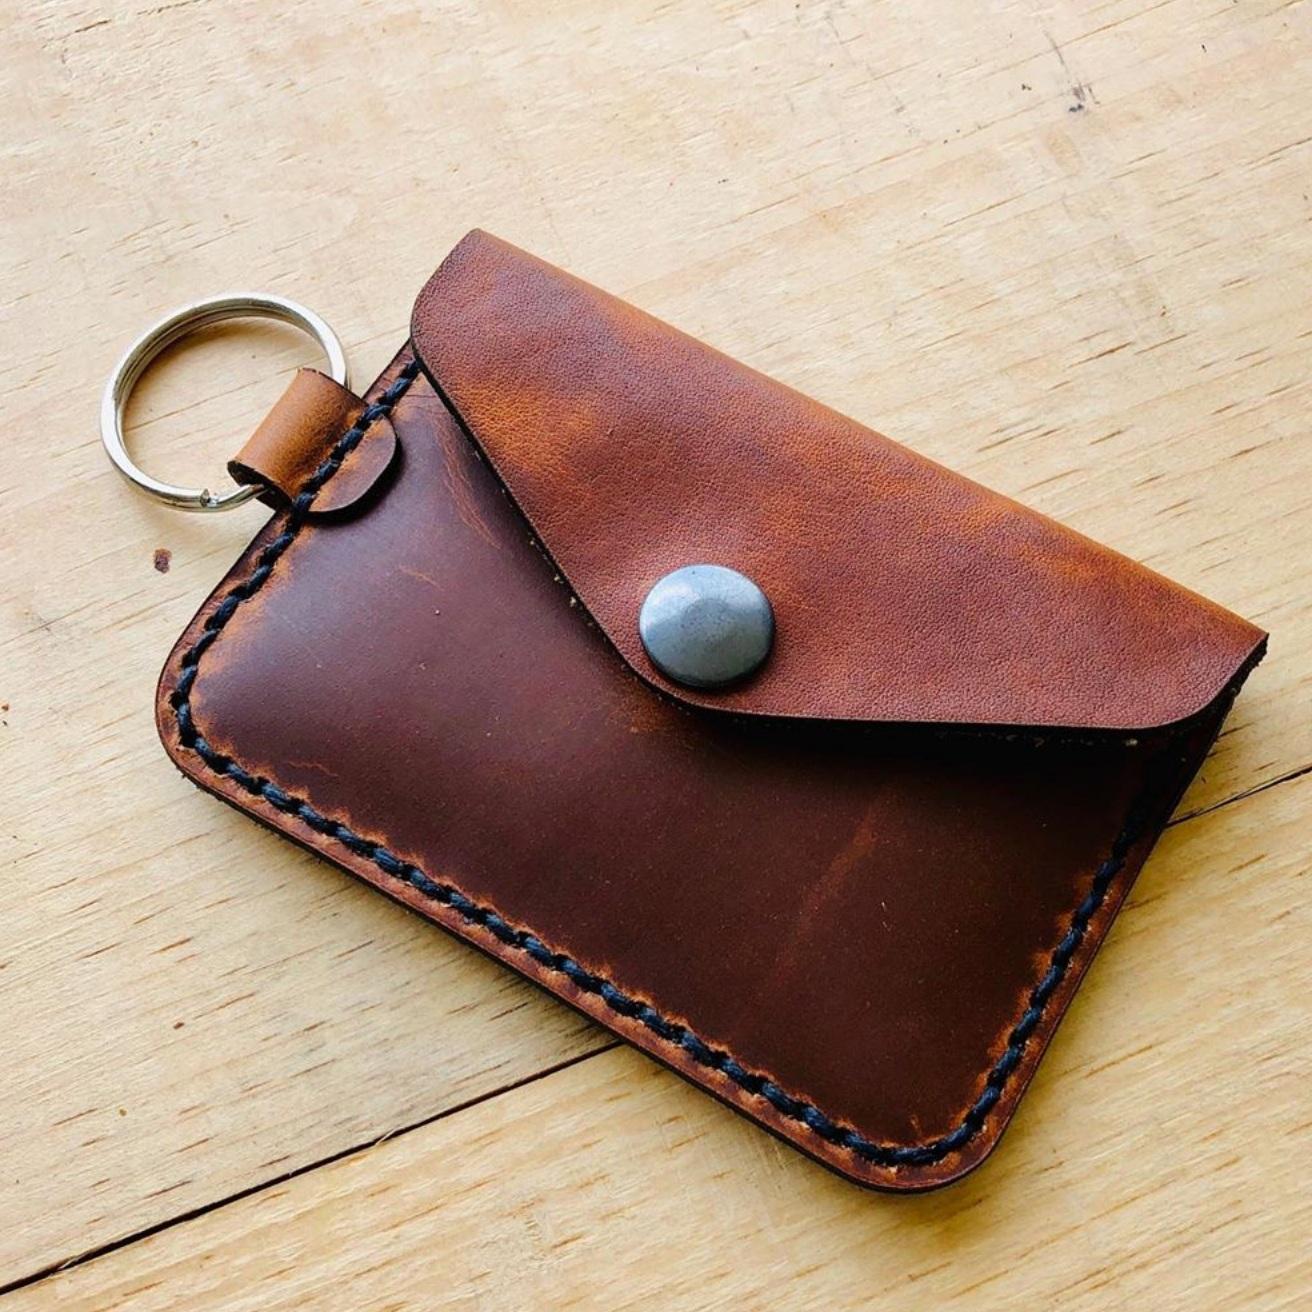 Snap Wallet - $18